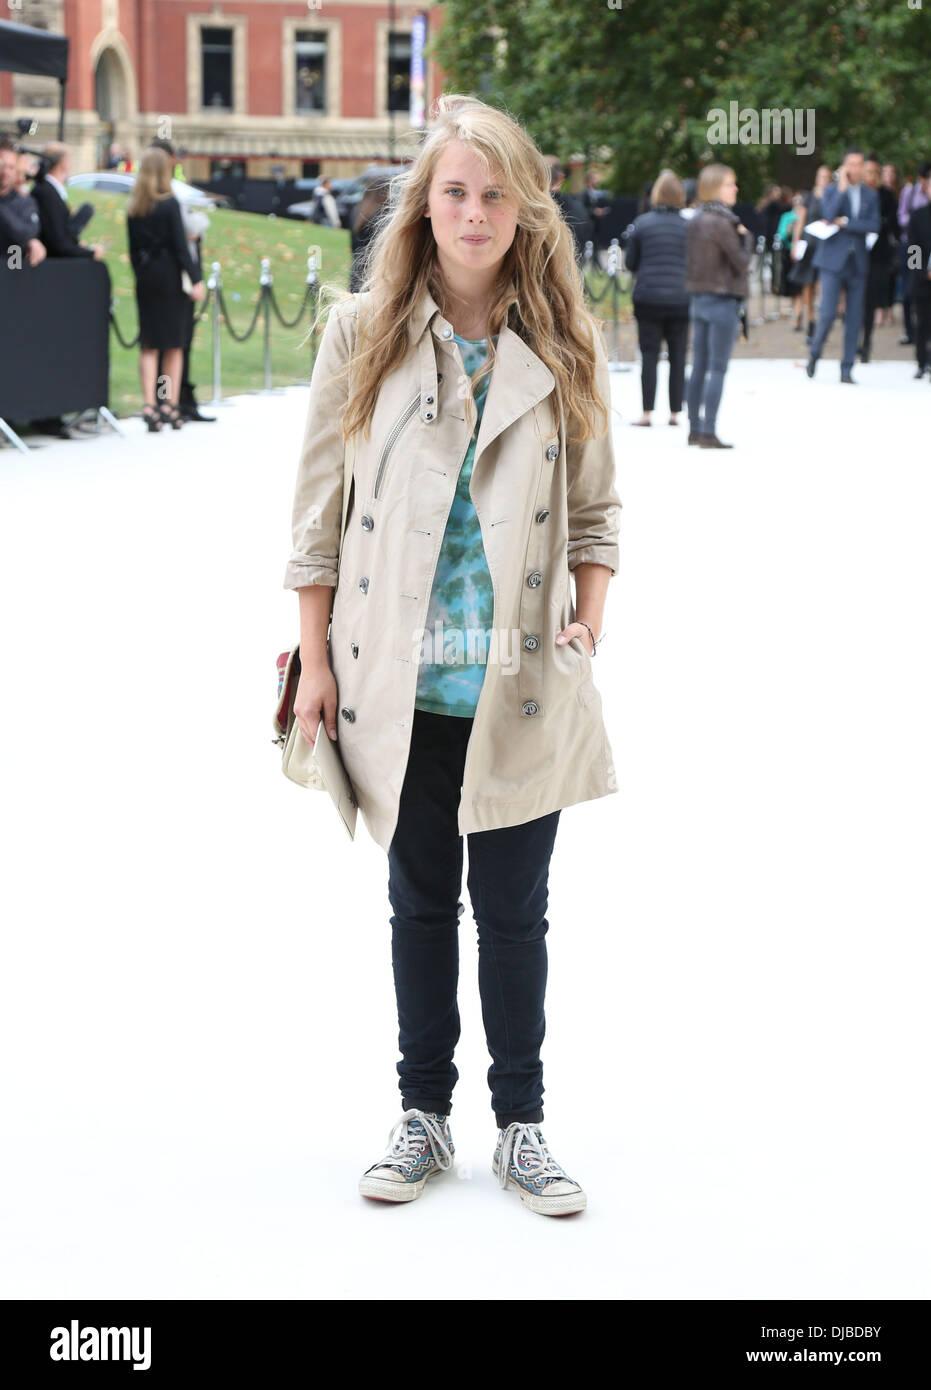 Maricka Hackman London Fashion Week Spring/Summer 2013 - Burberry - Arrivals London, England - 17.09.12 - Stock Image